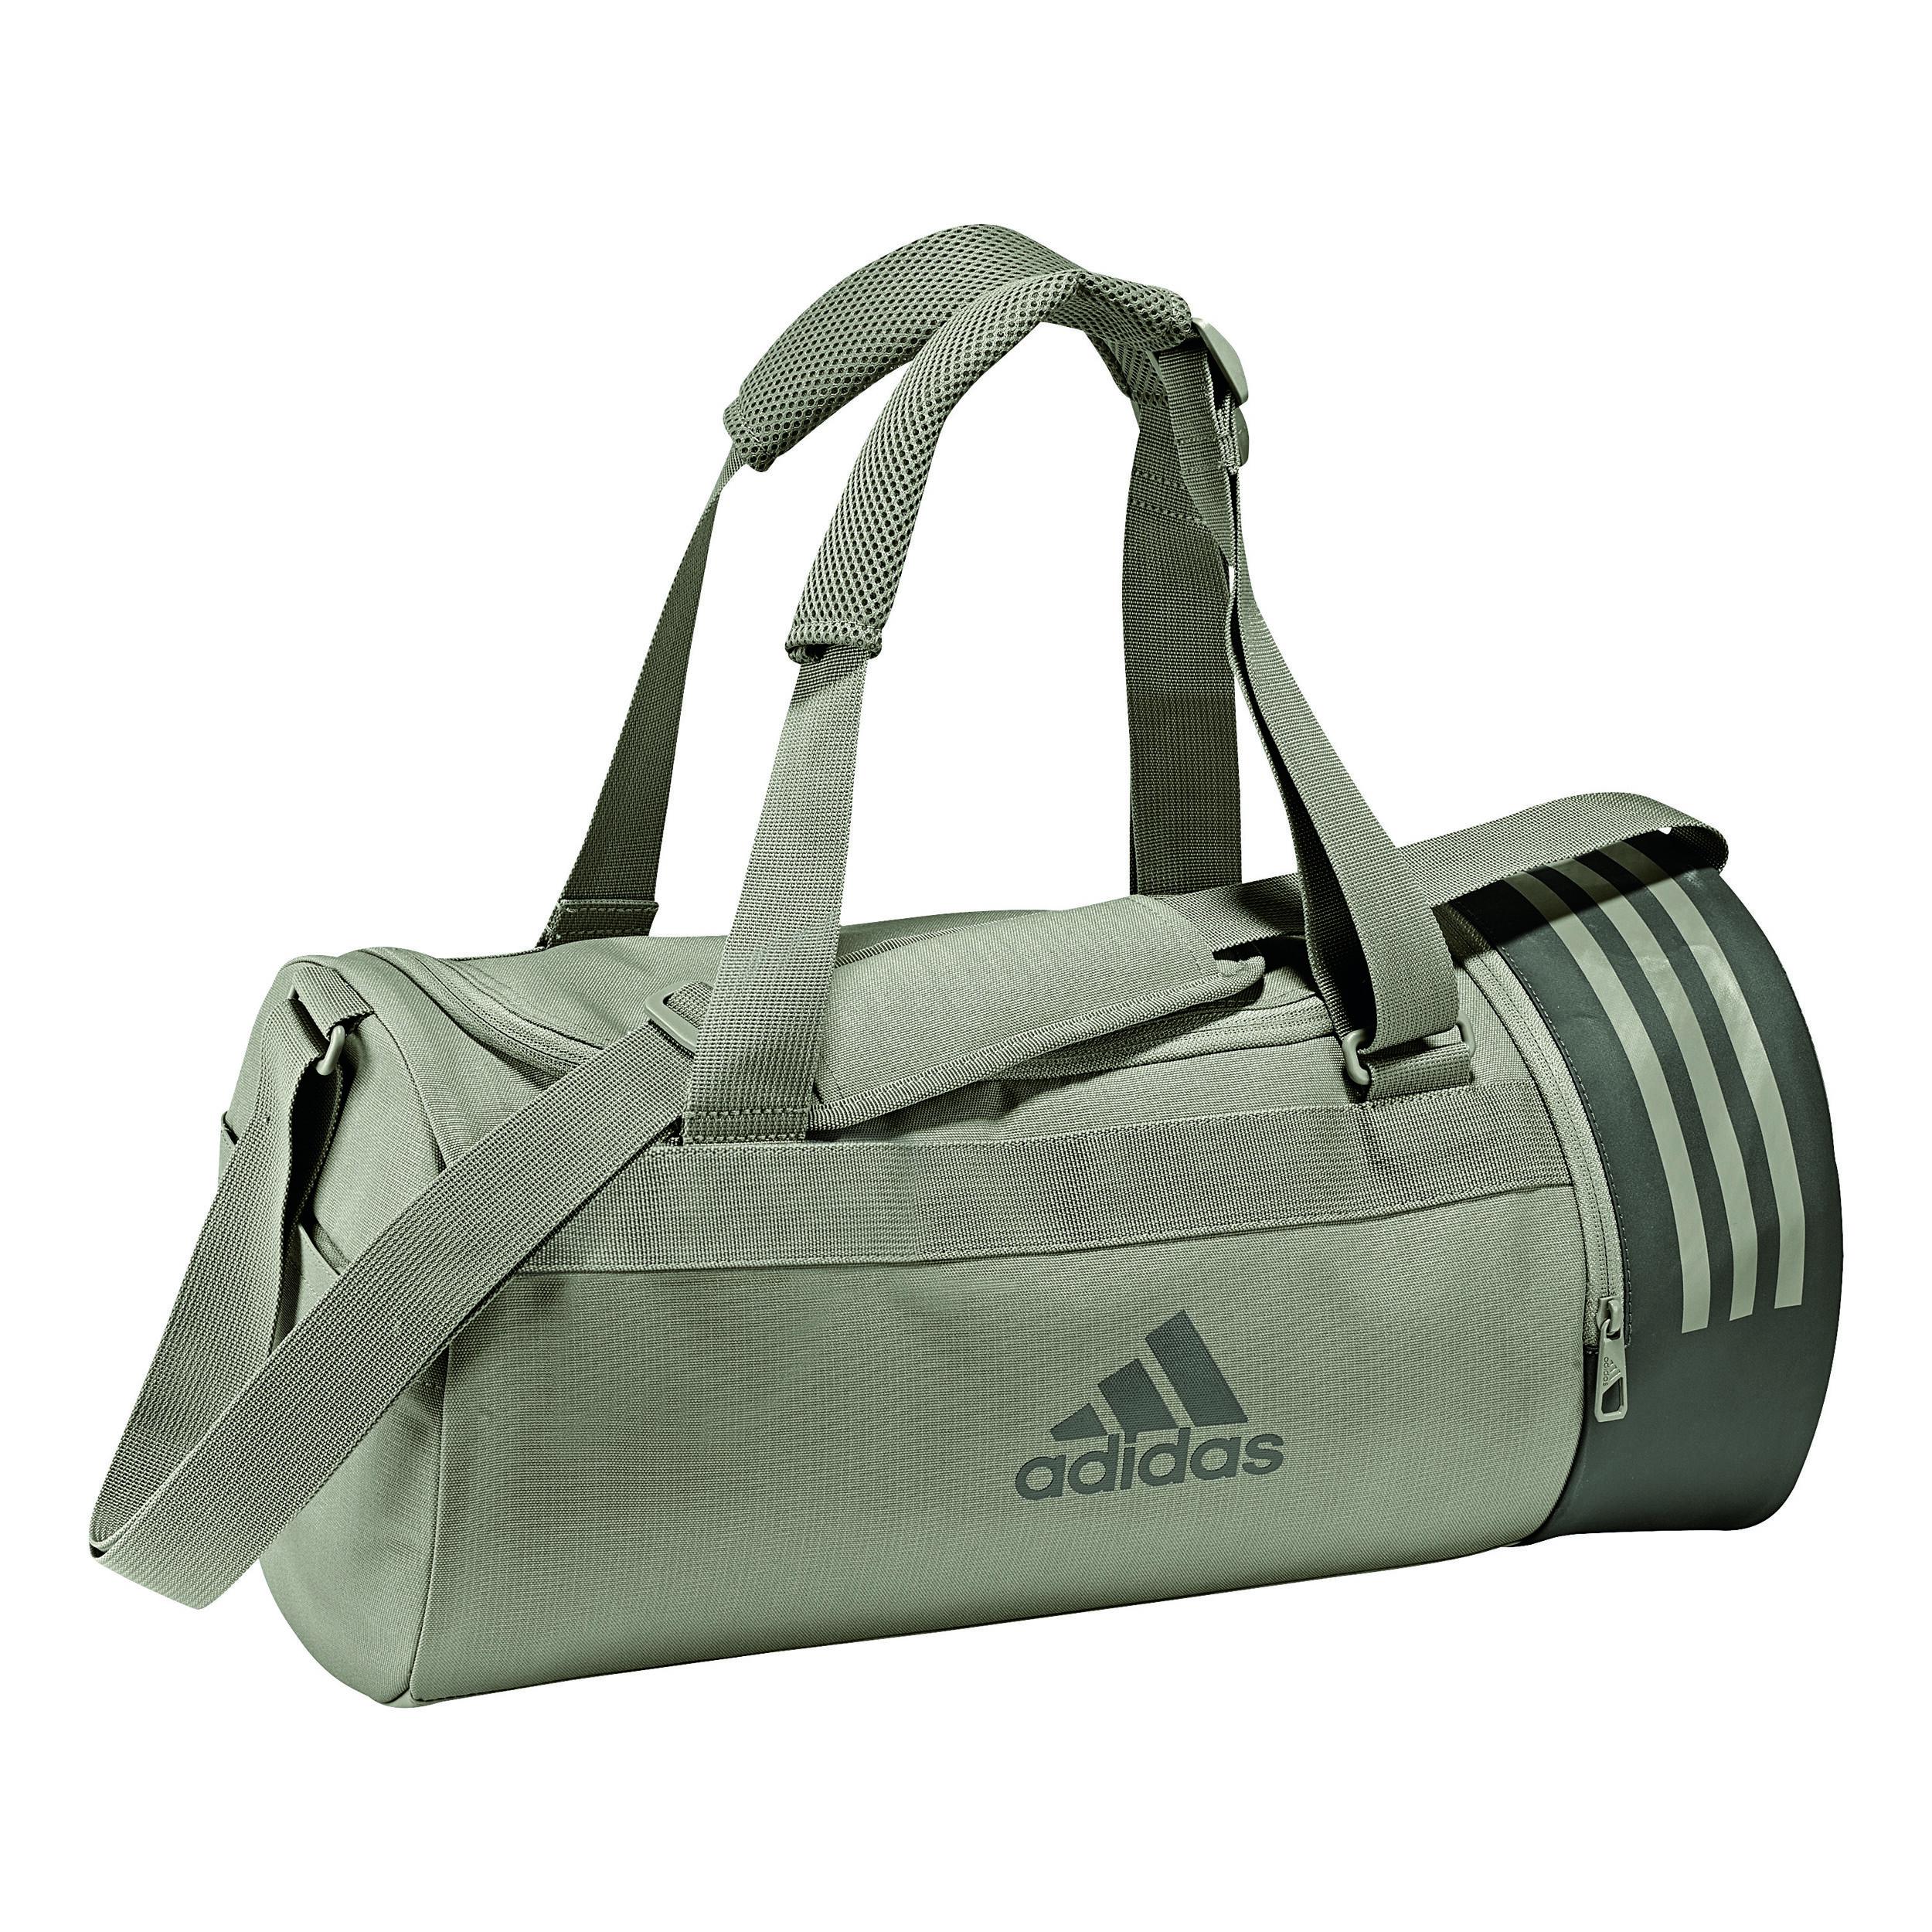 adidas Damen Training Core S Sporttasche